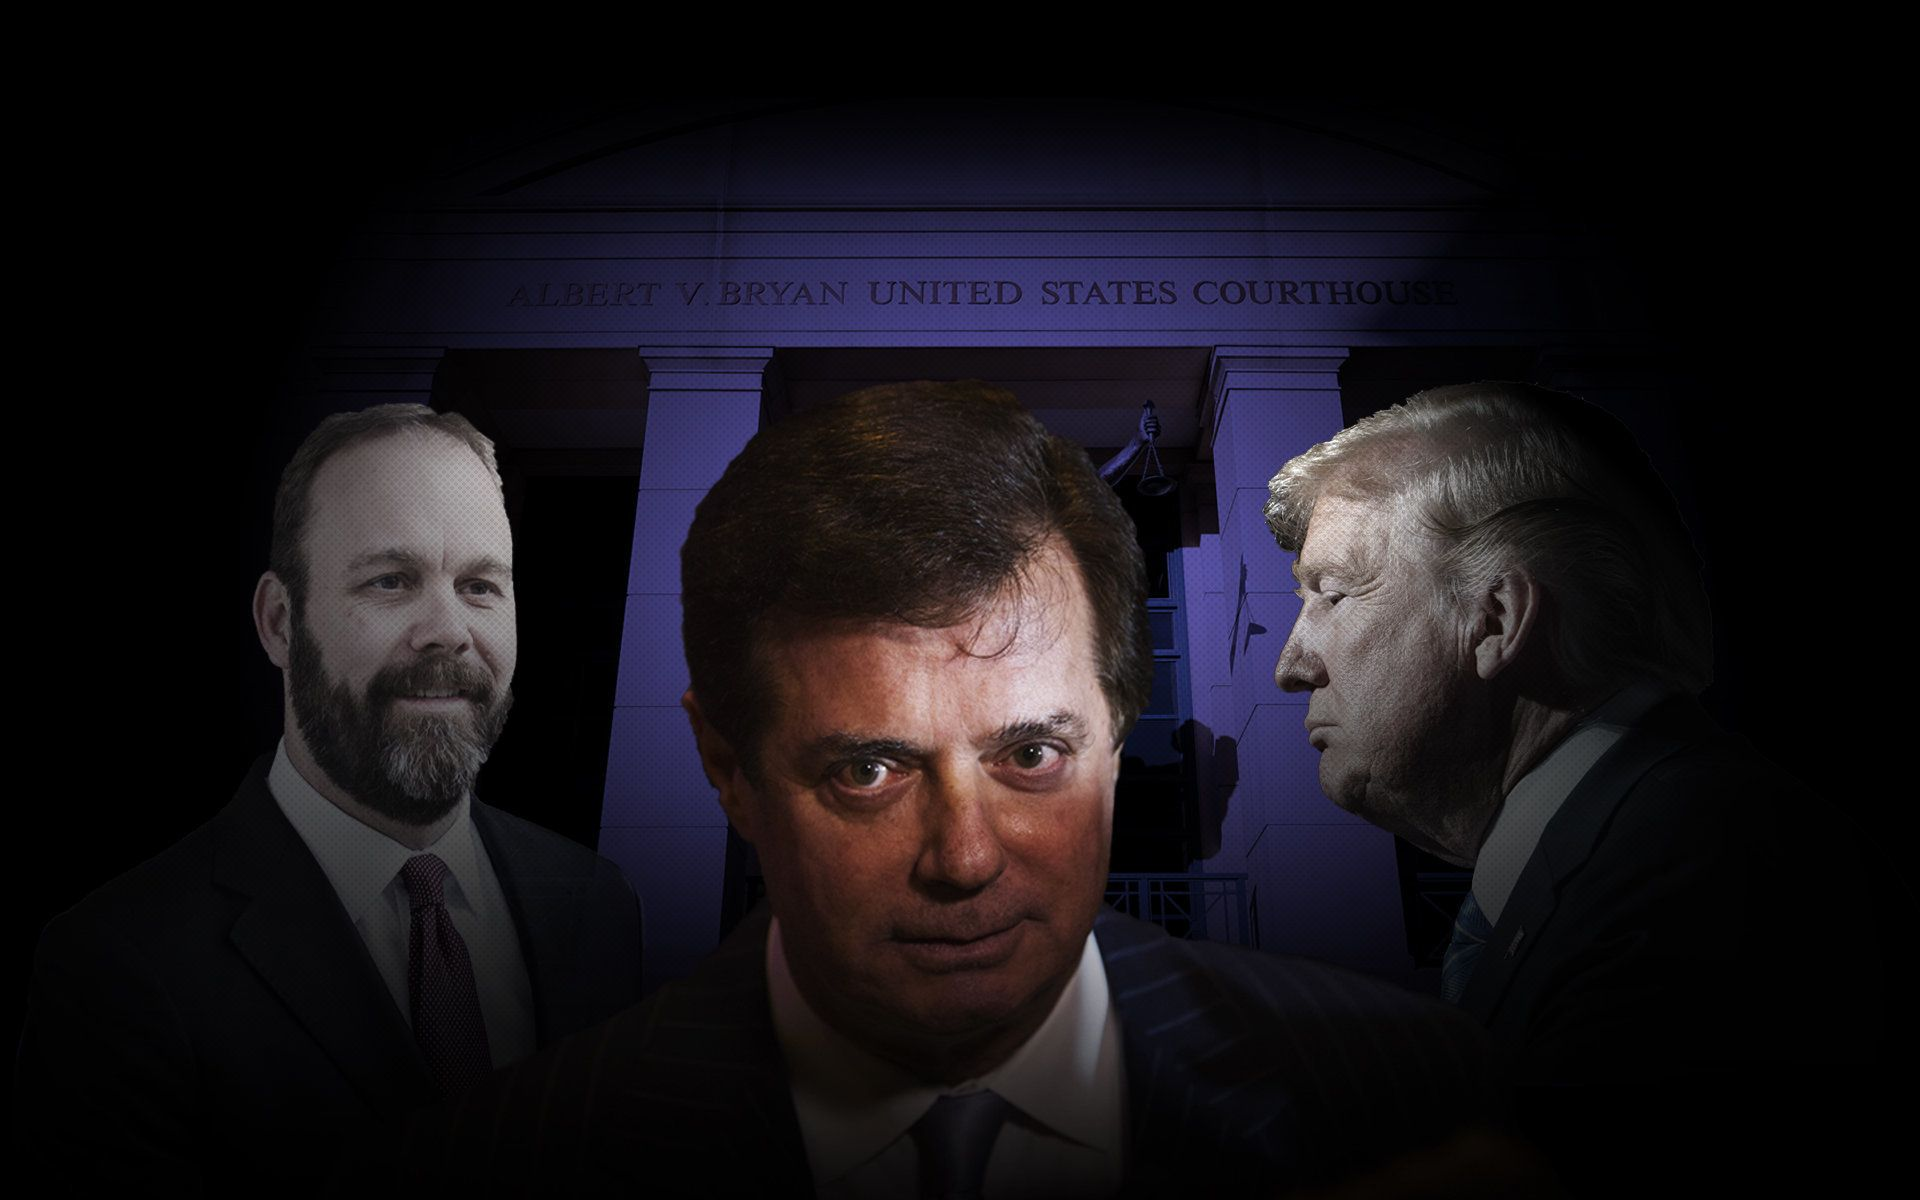 Tucker on Paul Manafort Trial: Lead Prosecutor Weissmann 'Avenging Hillary's Defeat'